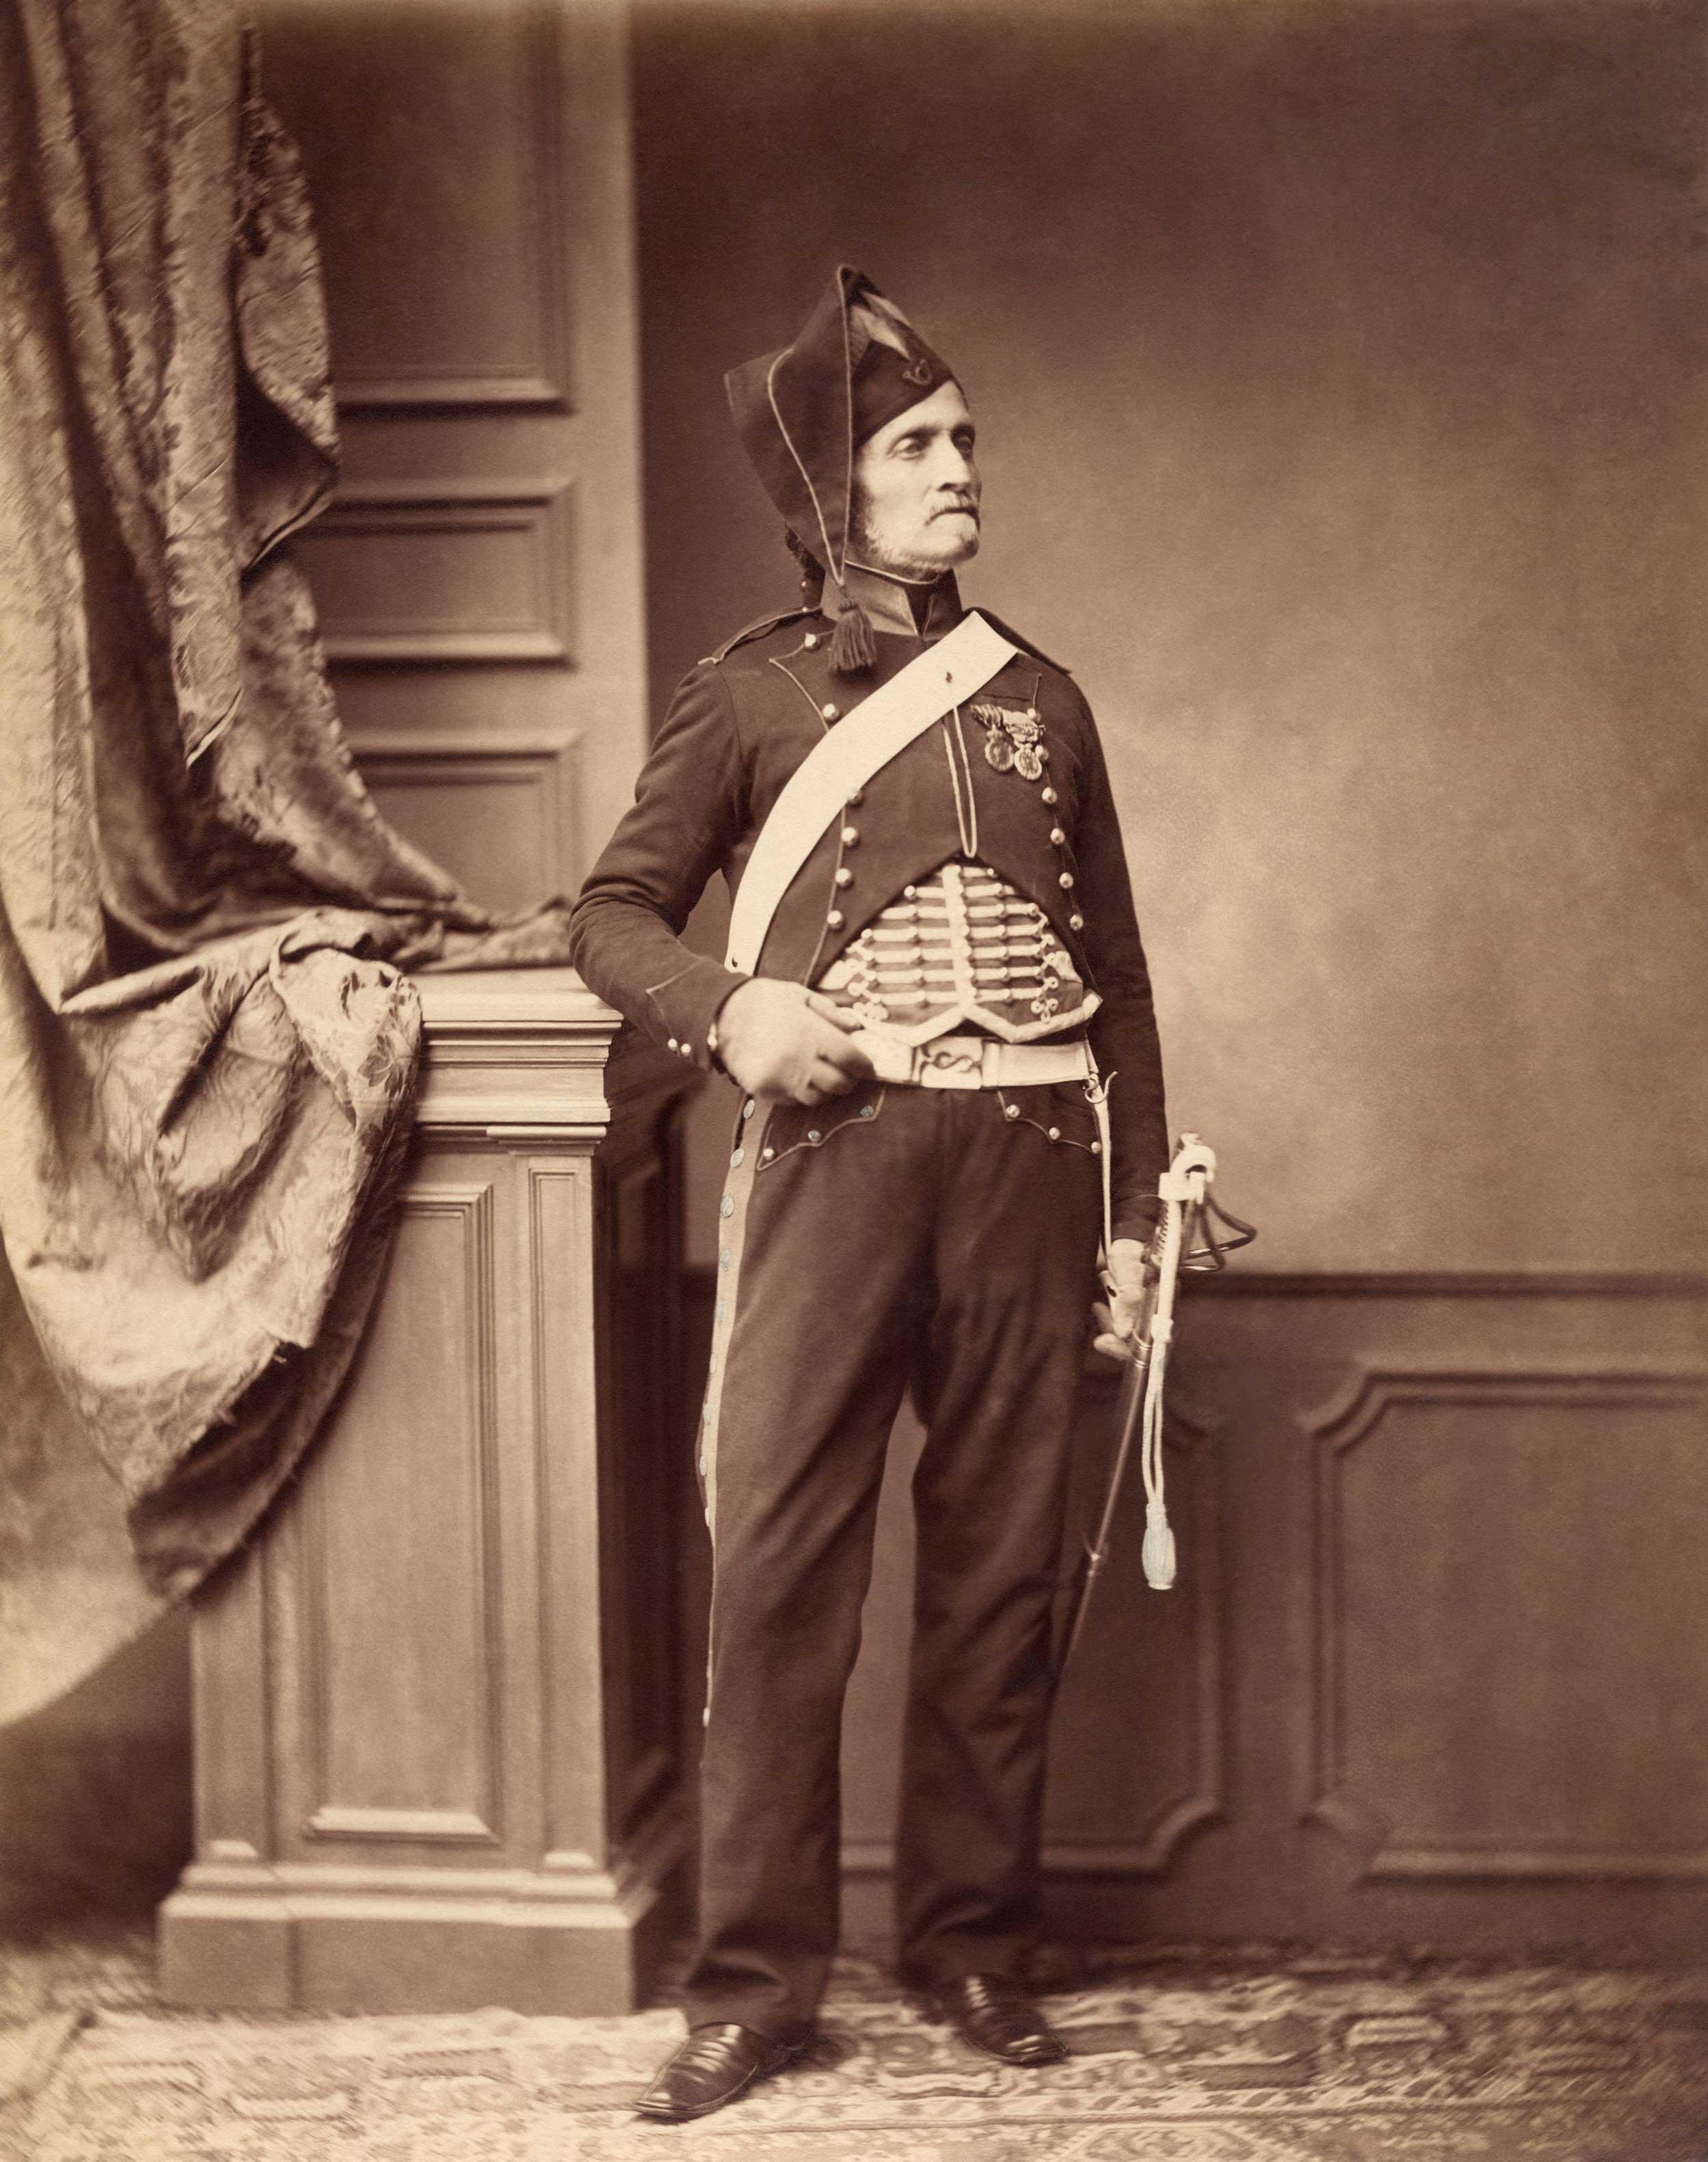 Monsieur Schmit, 2nd Mounted Chasseur Regiment, 1813-14